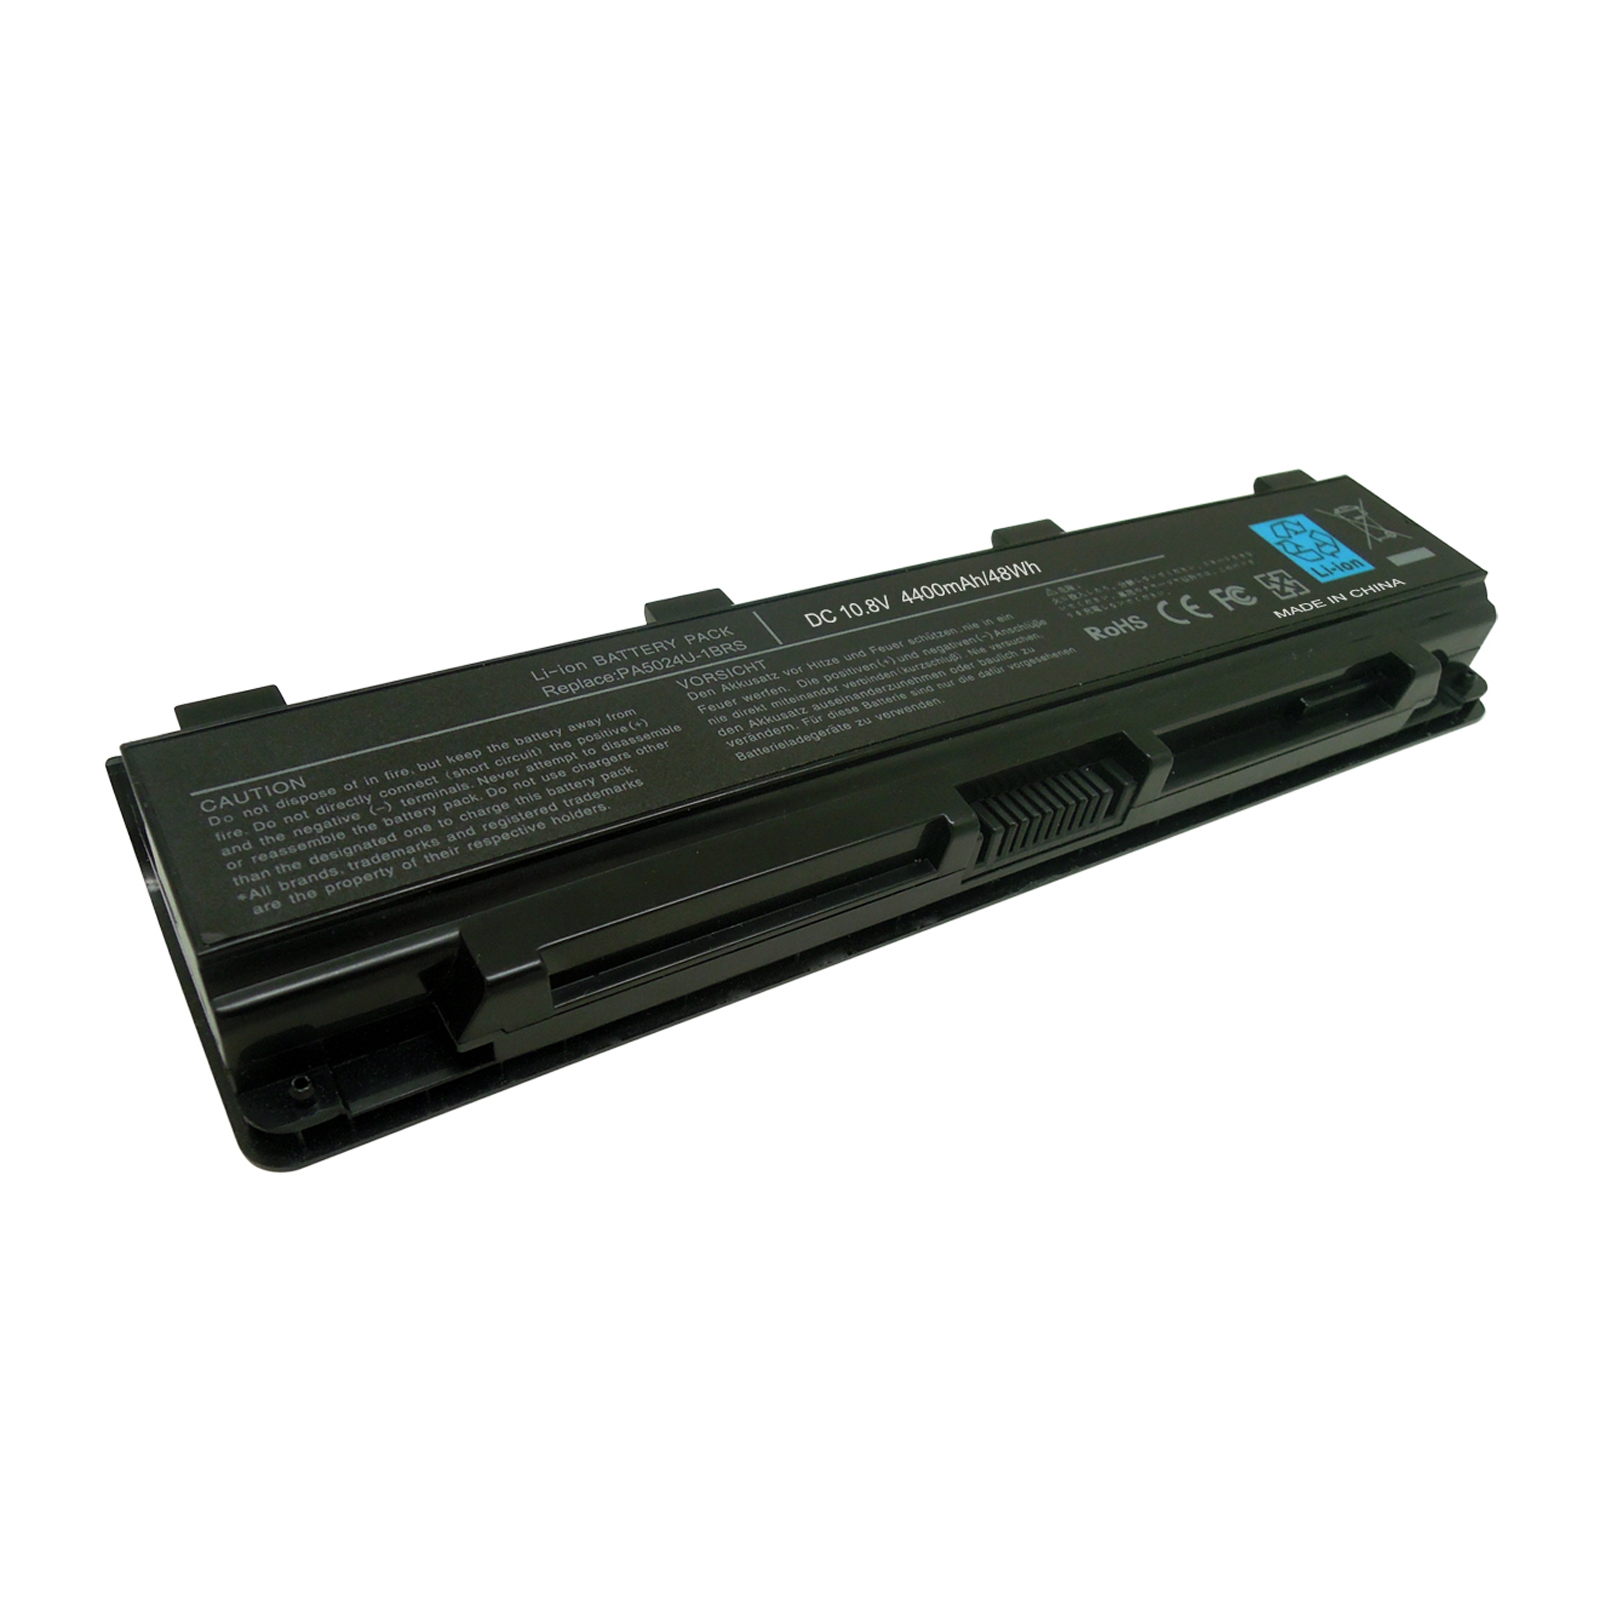 Superb Choice 6-cell TOSHIBA Satellite C850D-008 Laptop Batterry